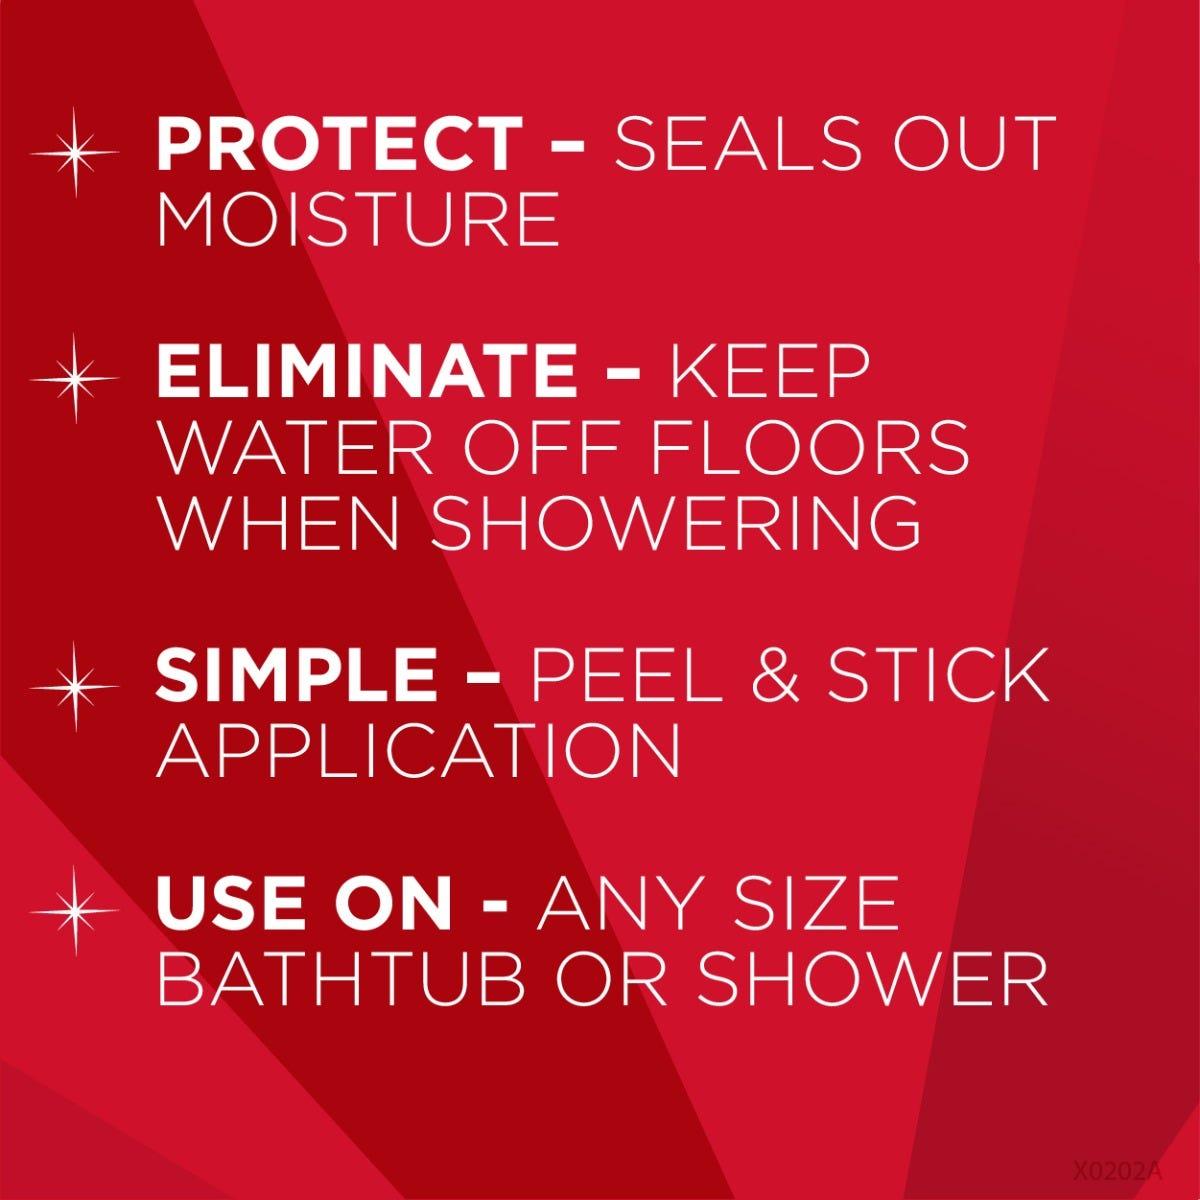 https://googone.com/media/catalog/product/s/p/splash_guard_benefits.jpg